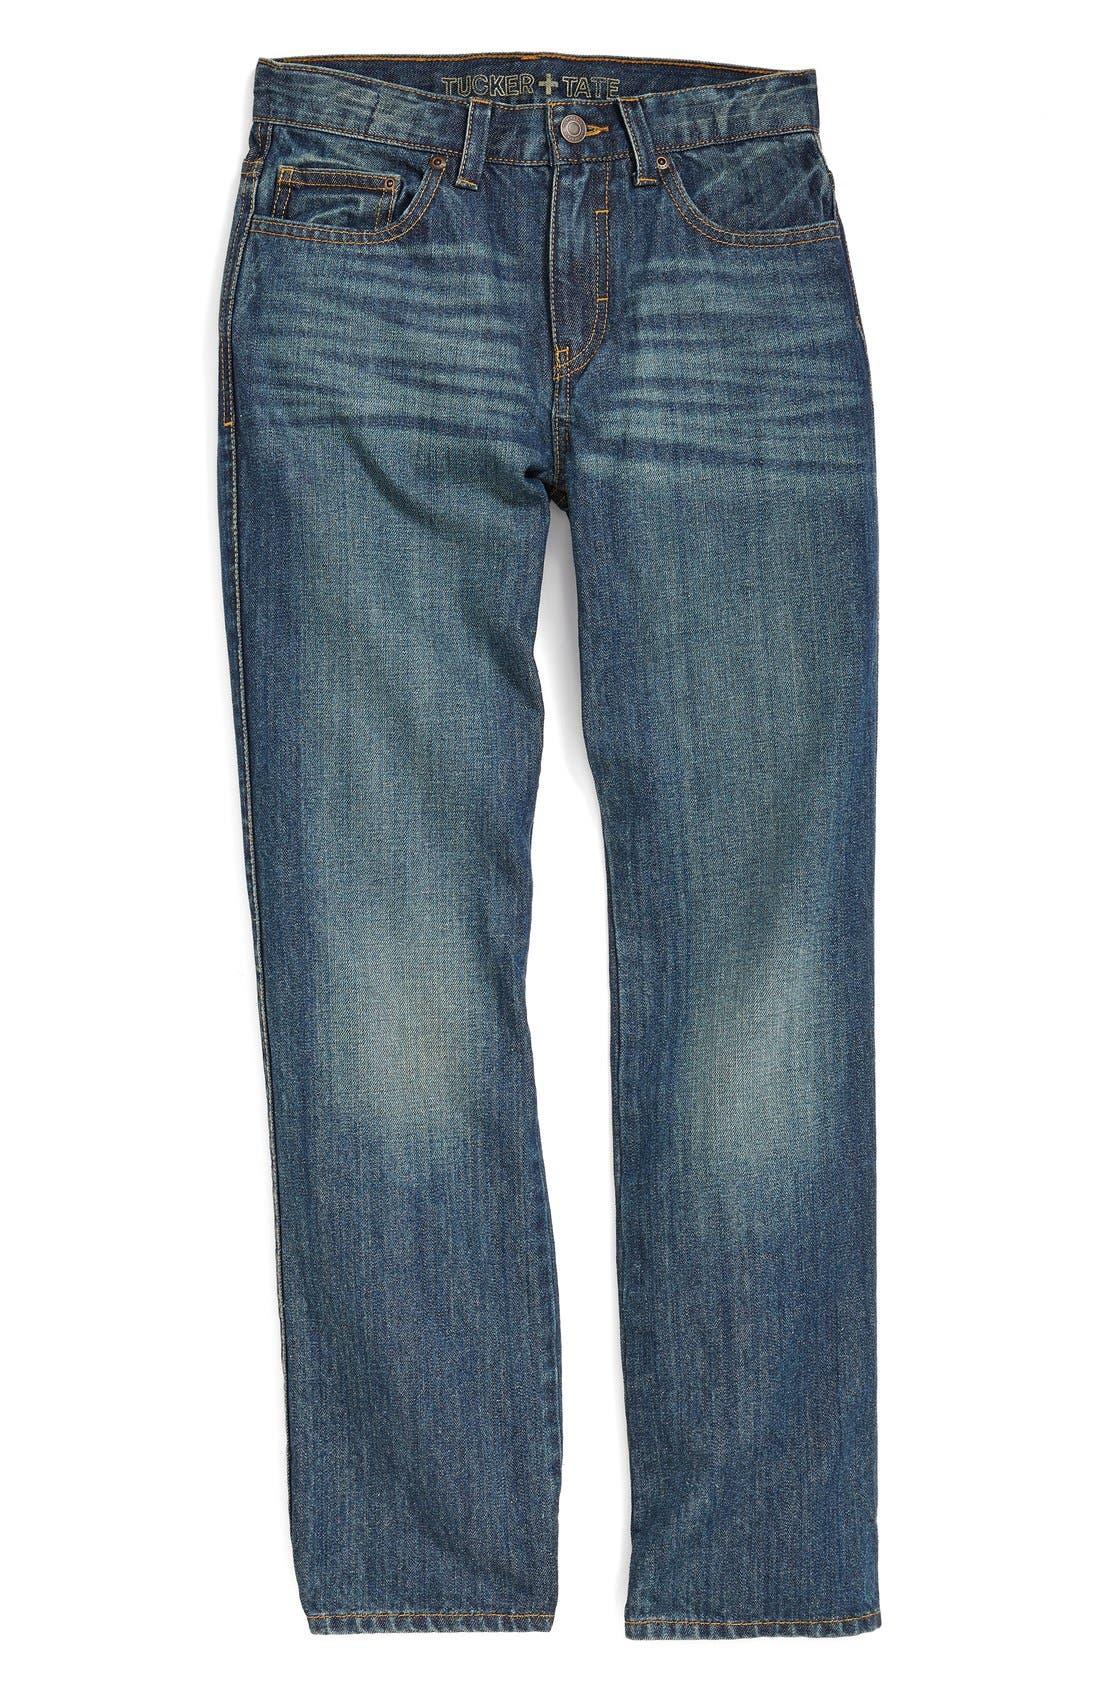 Alternate Image 1 Selected - Tucker + Tate Straight Leg Jeans (Big Boys)